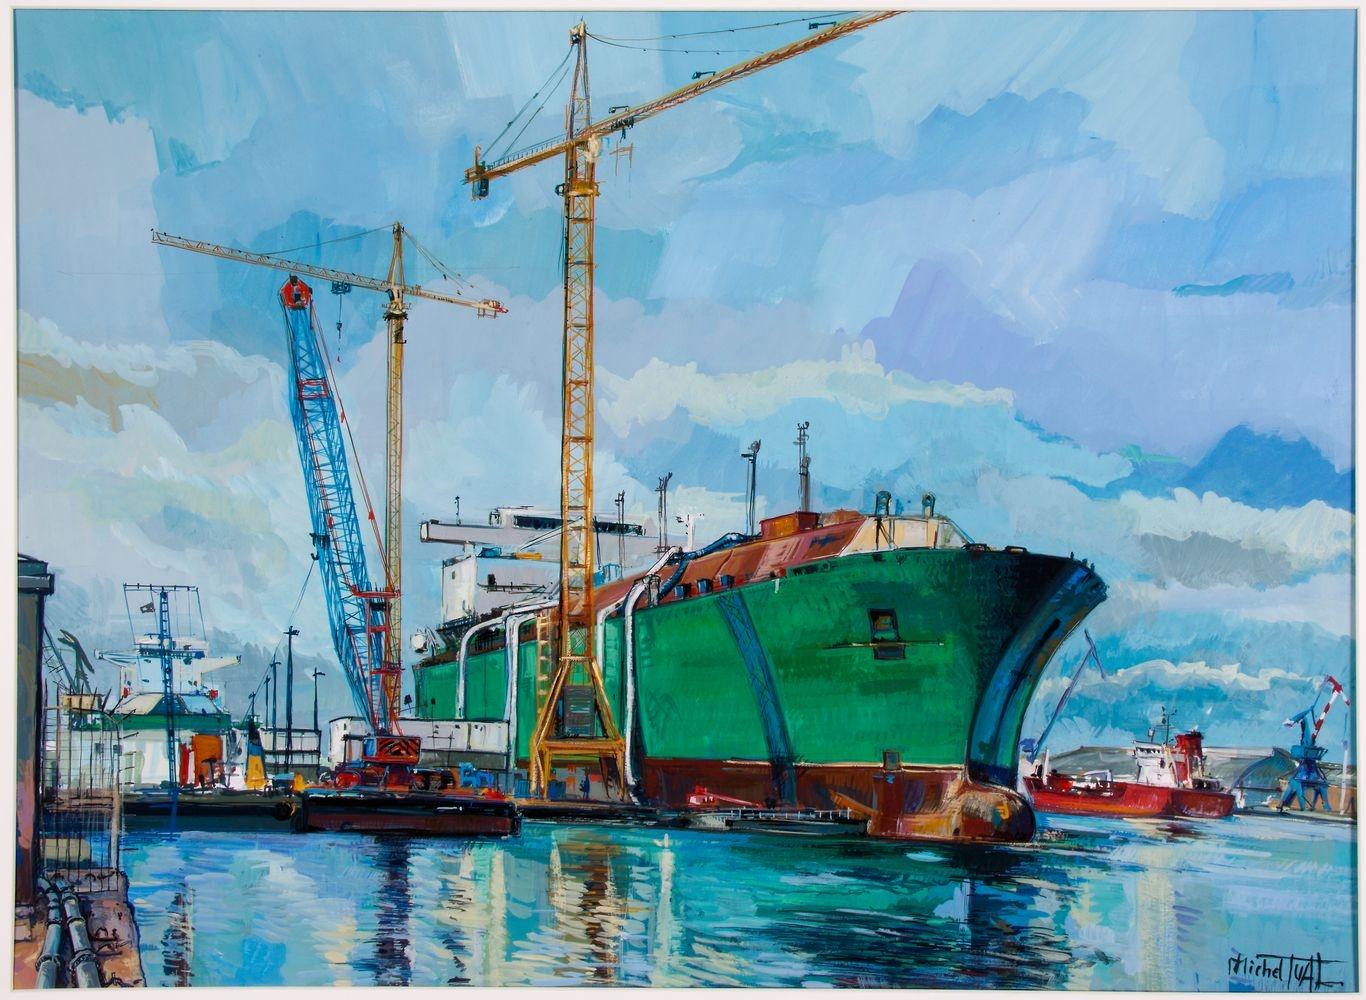 Peinture Provalys - Michel Tual